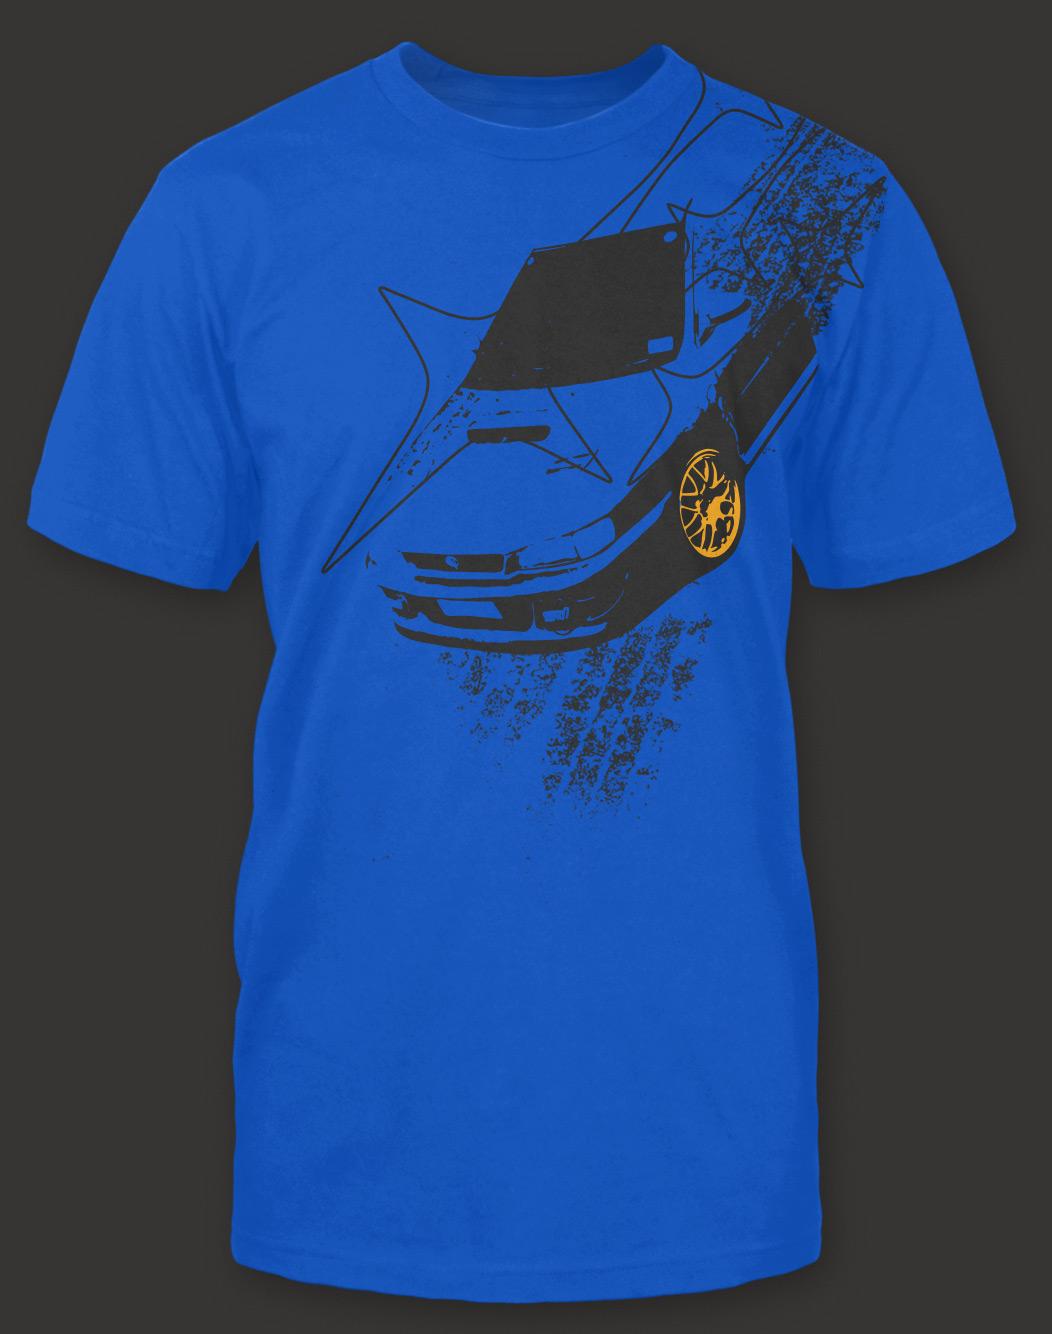 Subaru Impreza 22b Shirt Blue 183 Gearheart Shirts